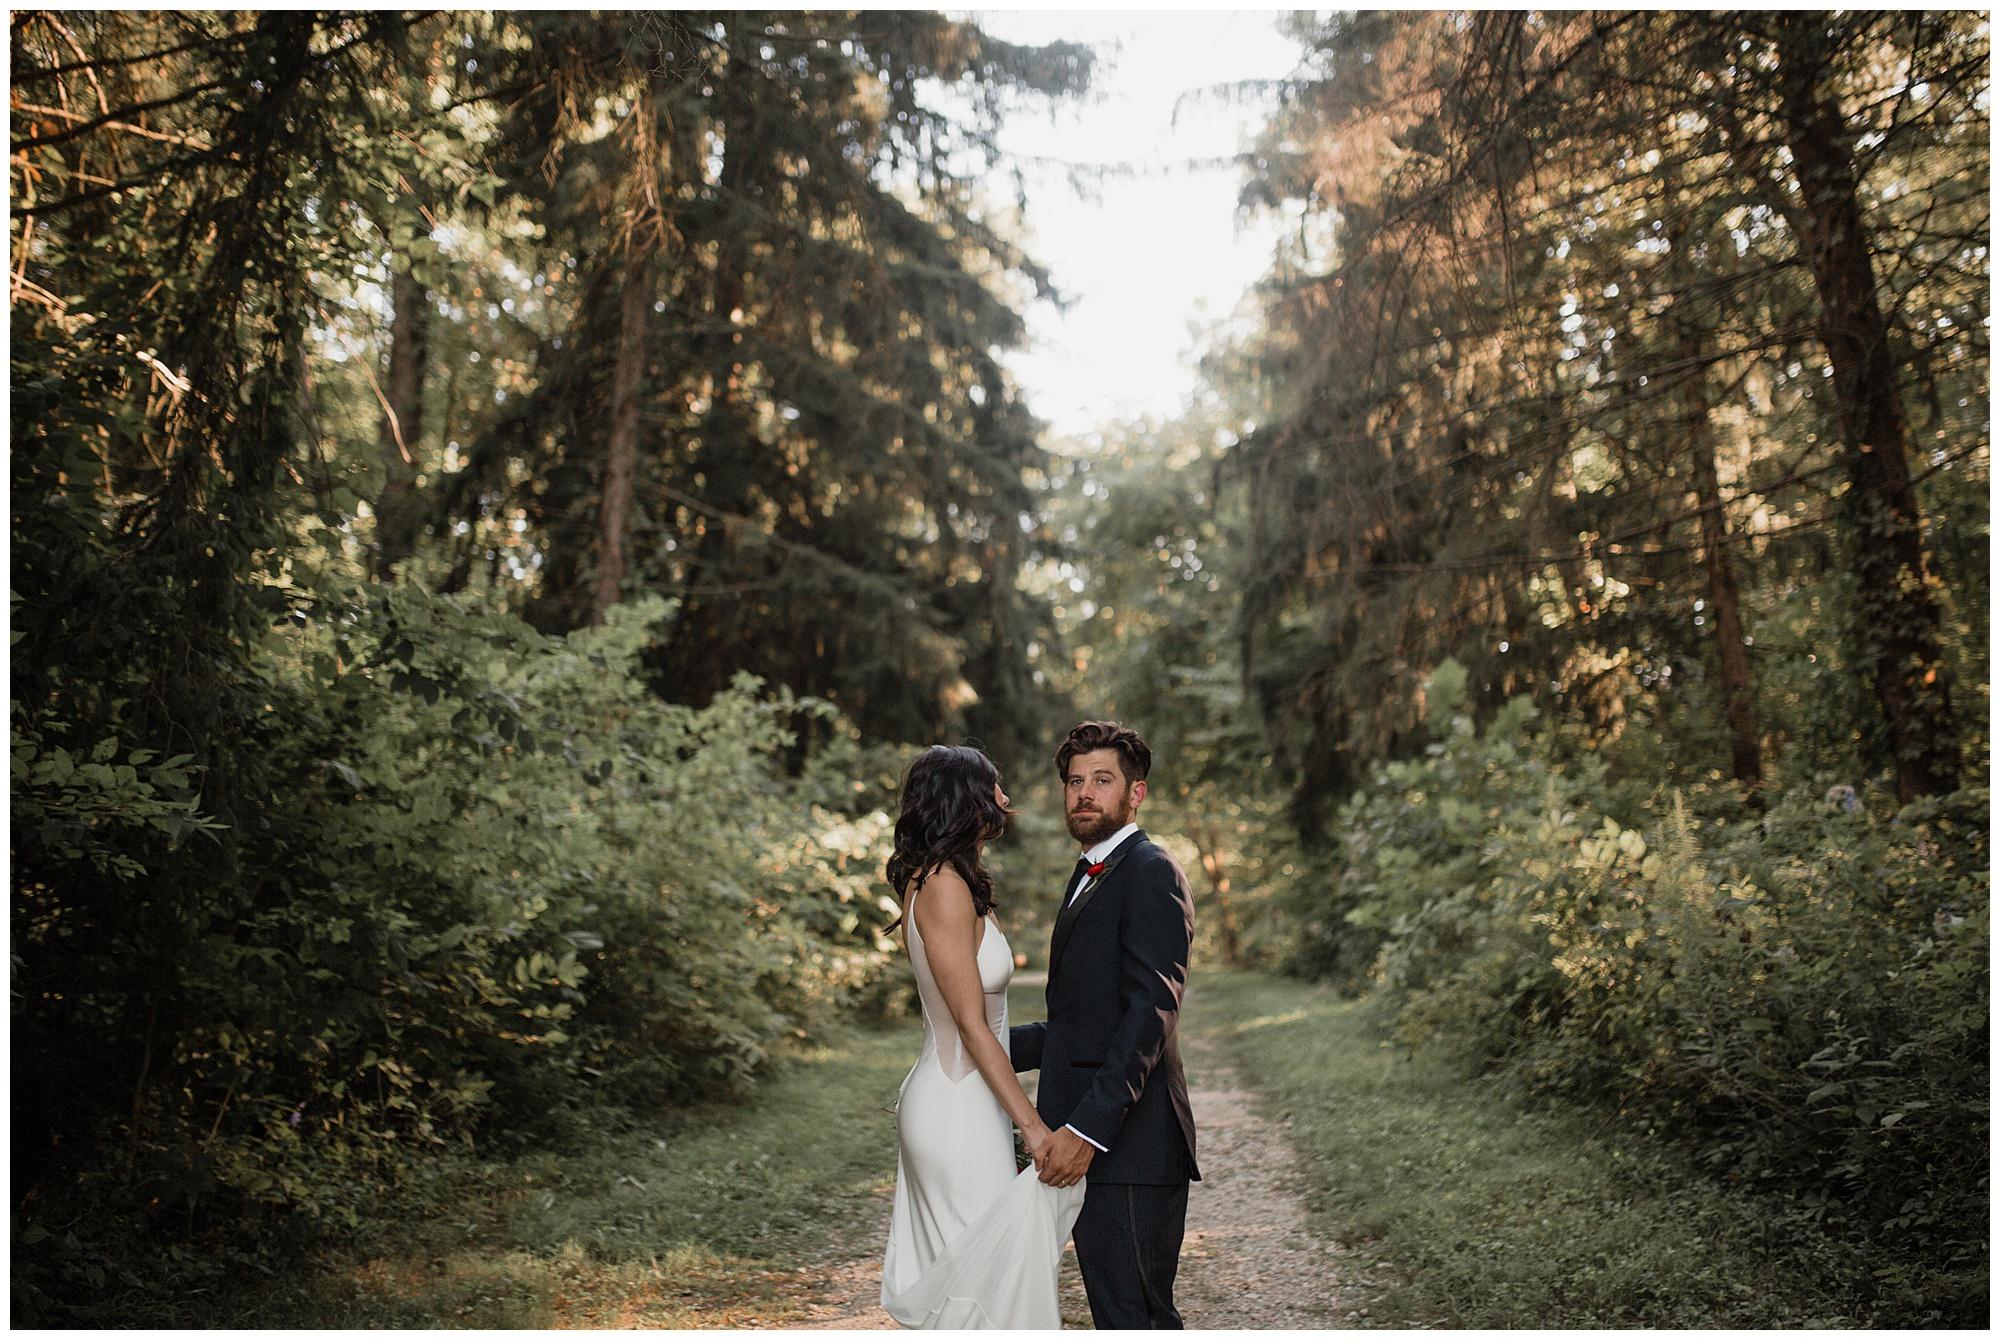 allerton_park_wedding_champaign_il_chicago_wright_photographs_ne_0093.jpg